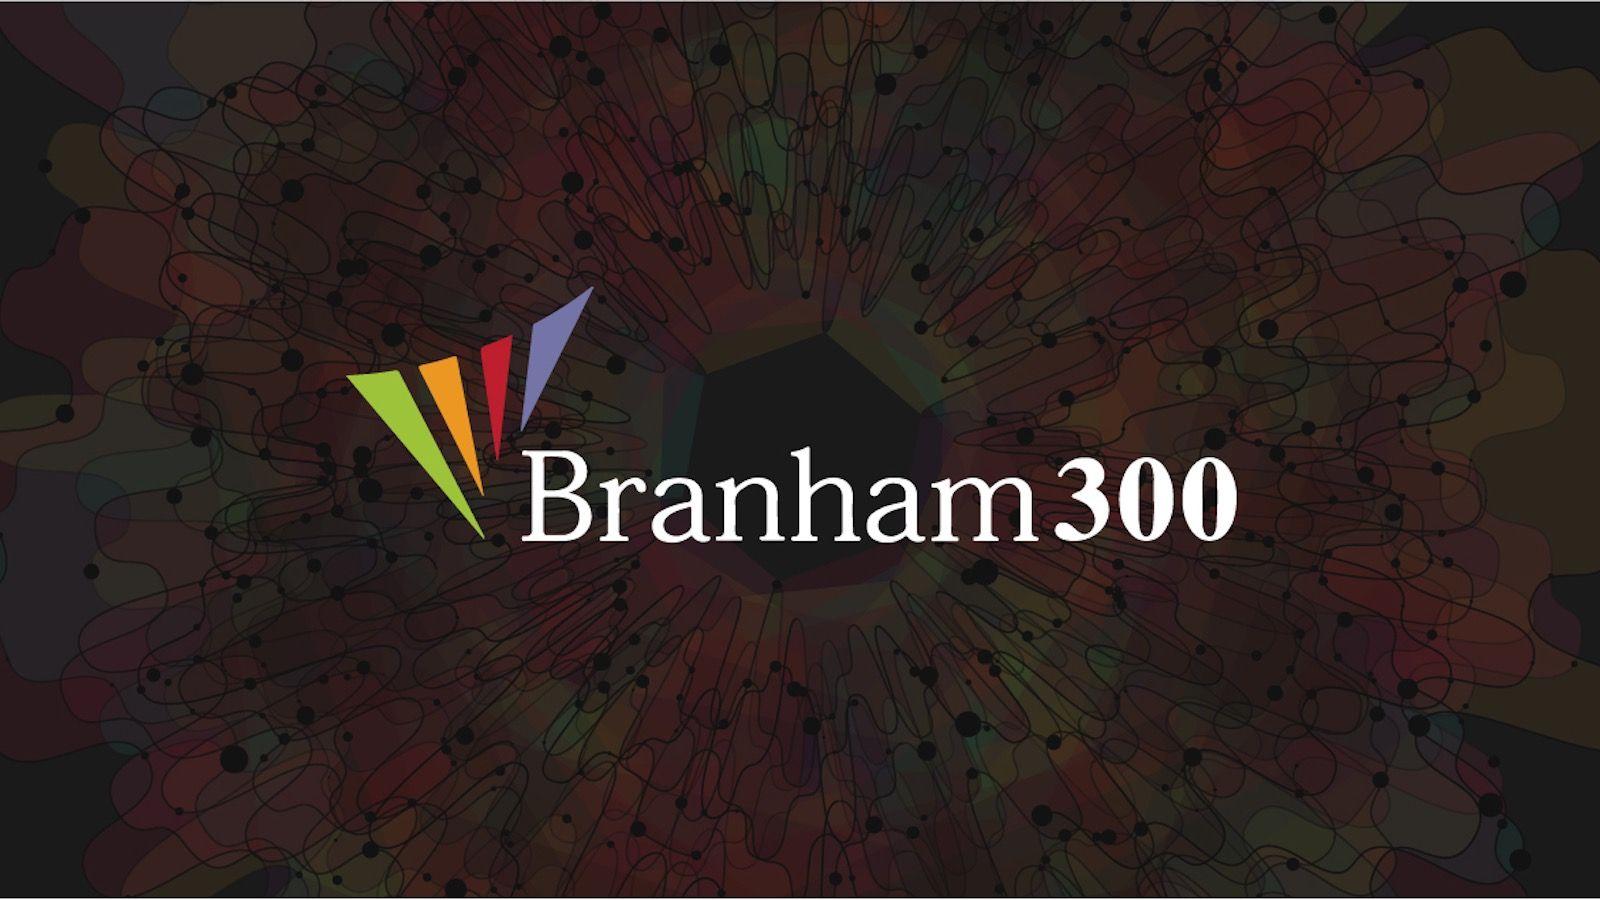 mobileLIVE Branham 300 award